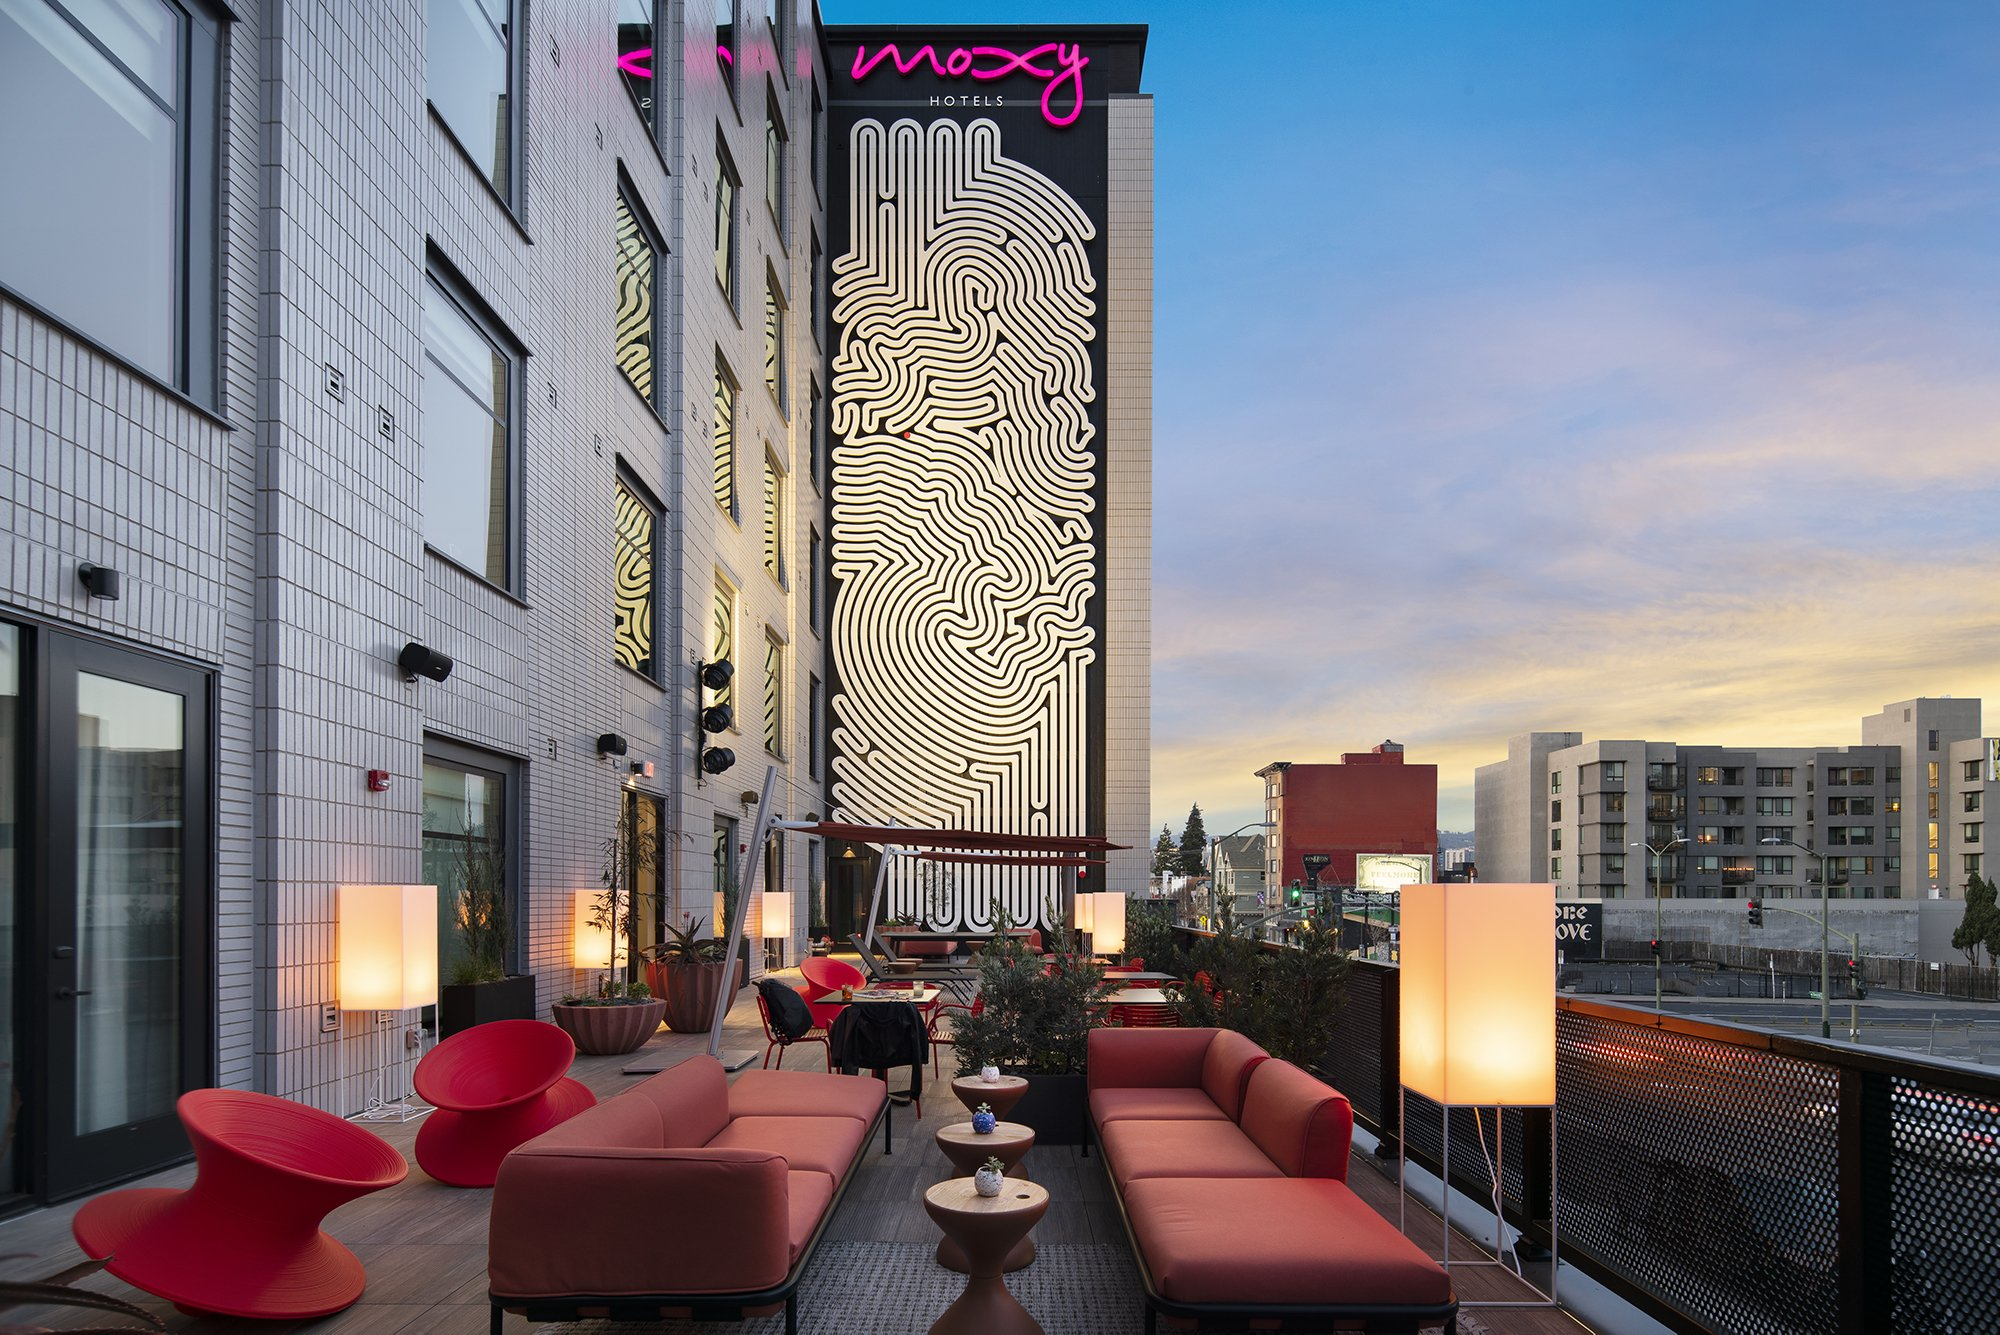 Moxy Hotel-Oakland, CA-Lowney Architecture-16